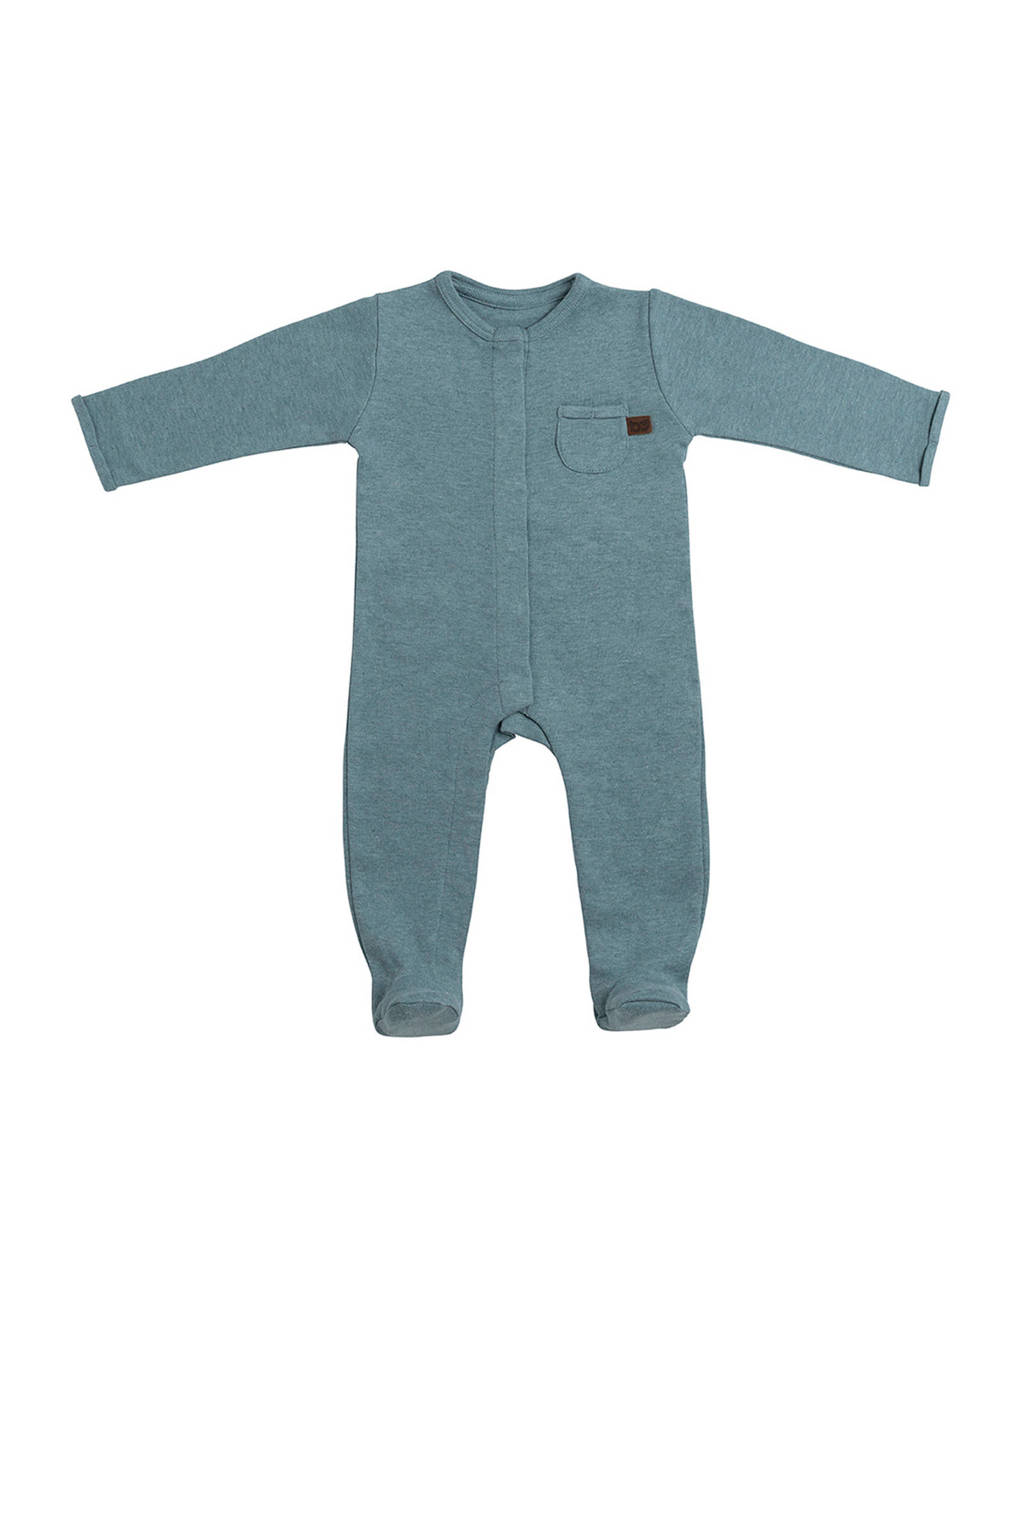 Baby's Only newborn baby boxpak, Grijsgroen